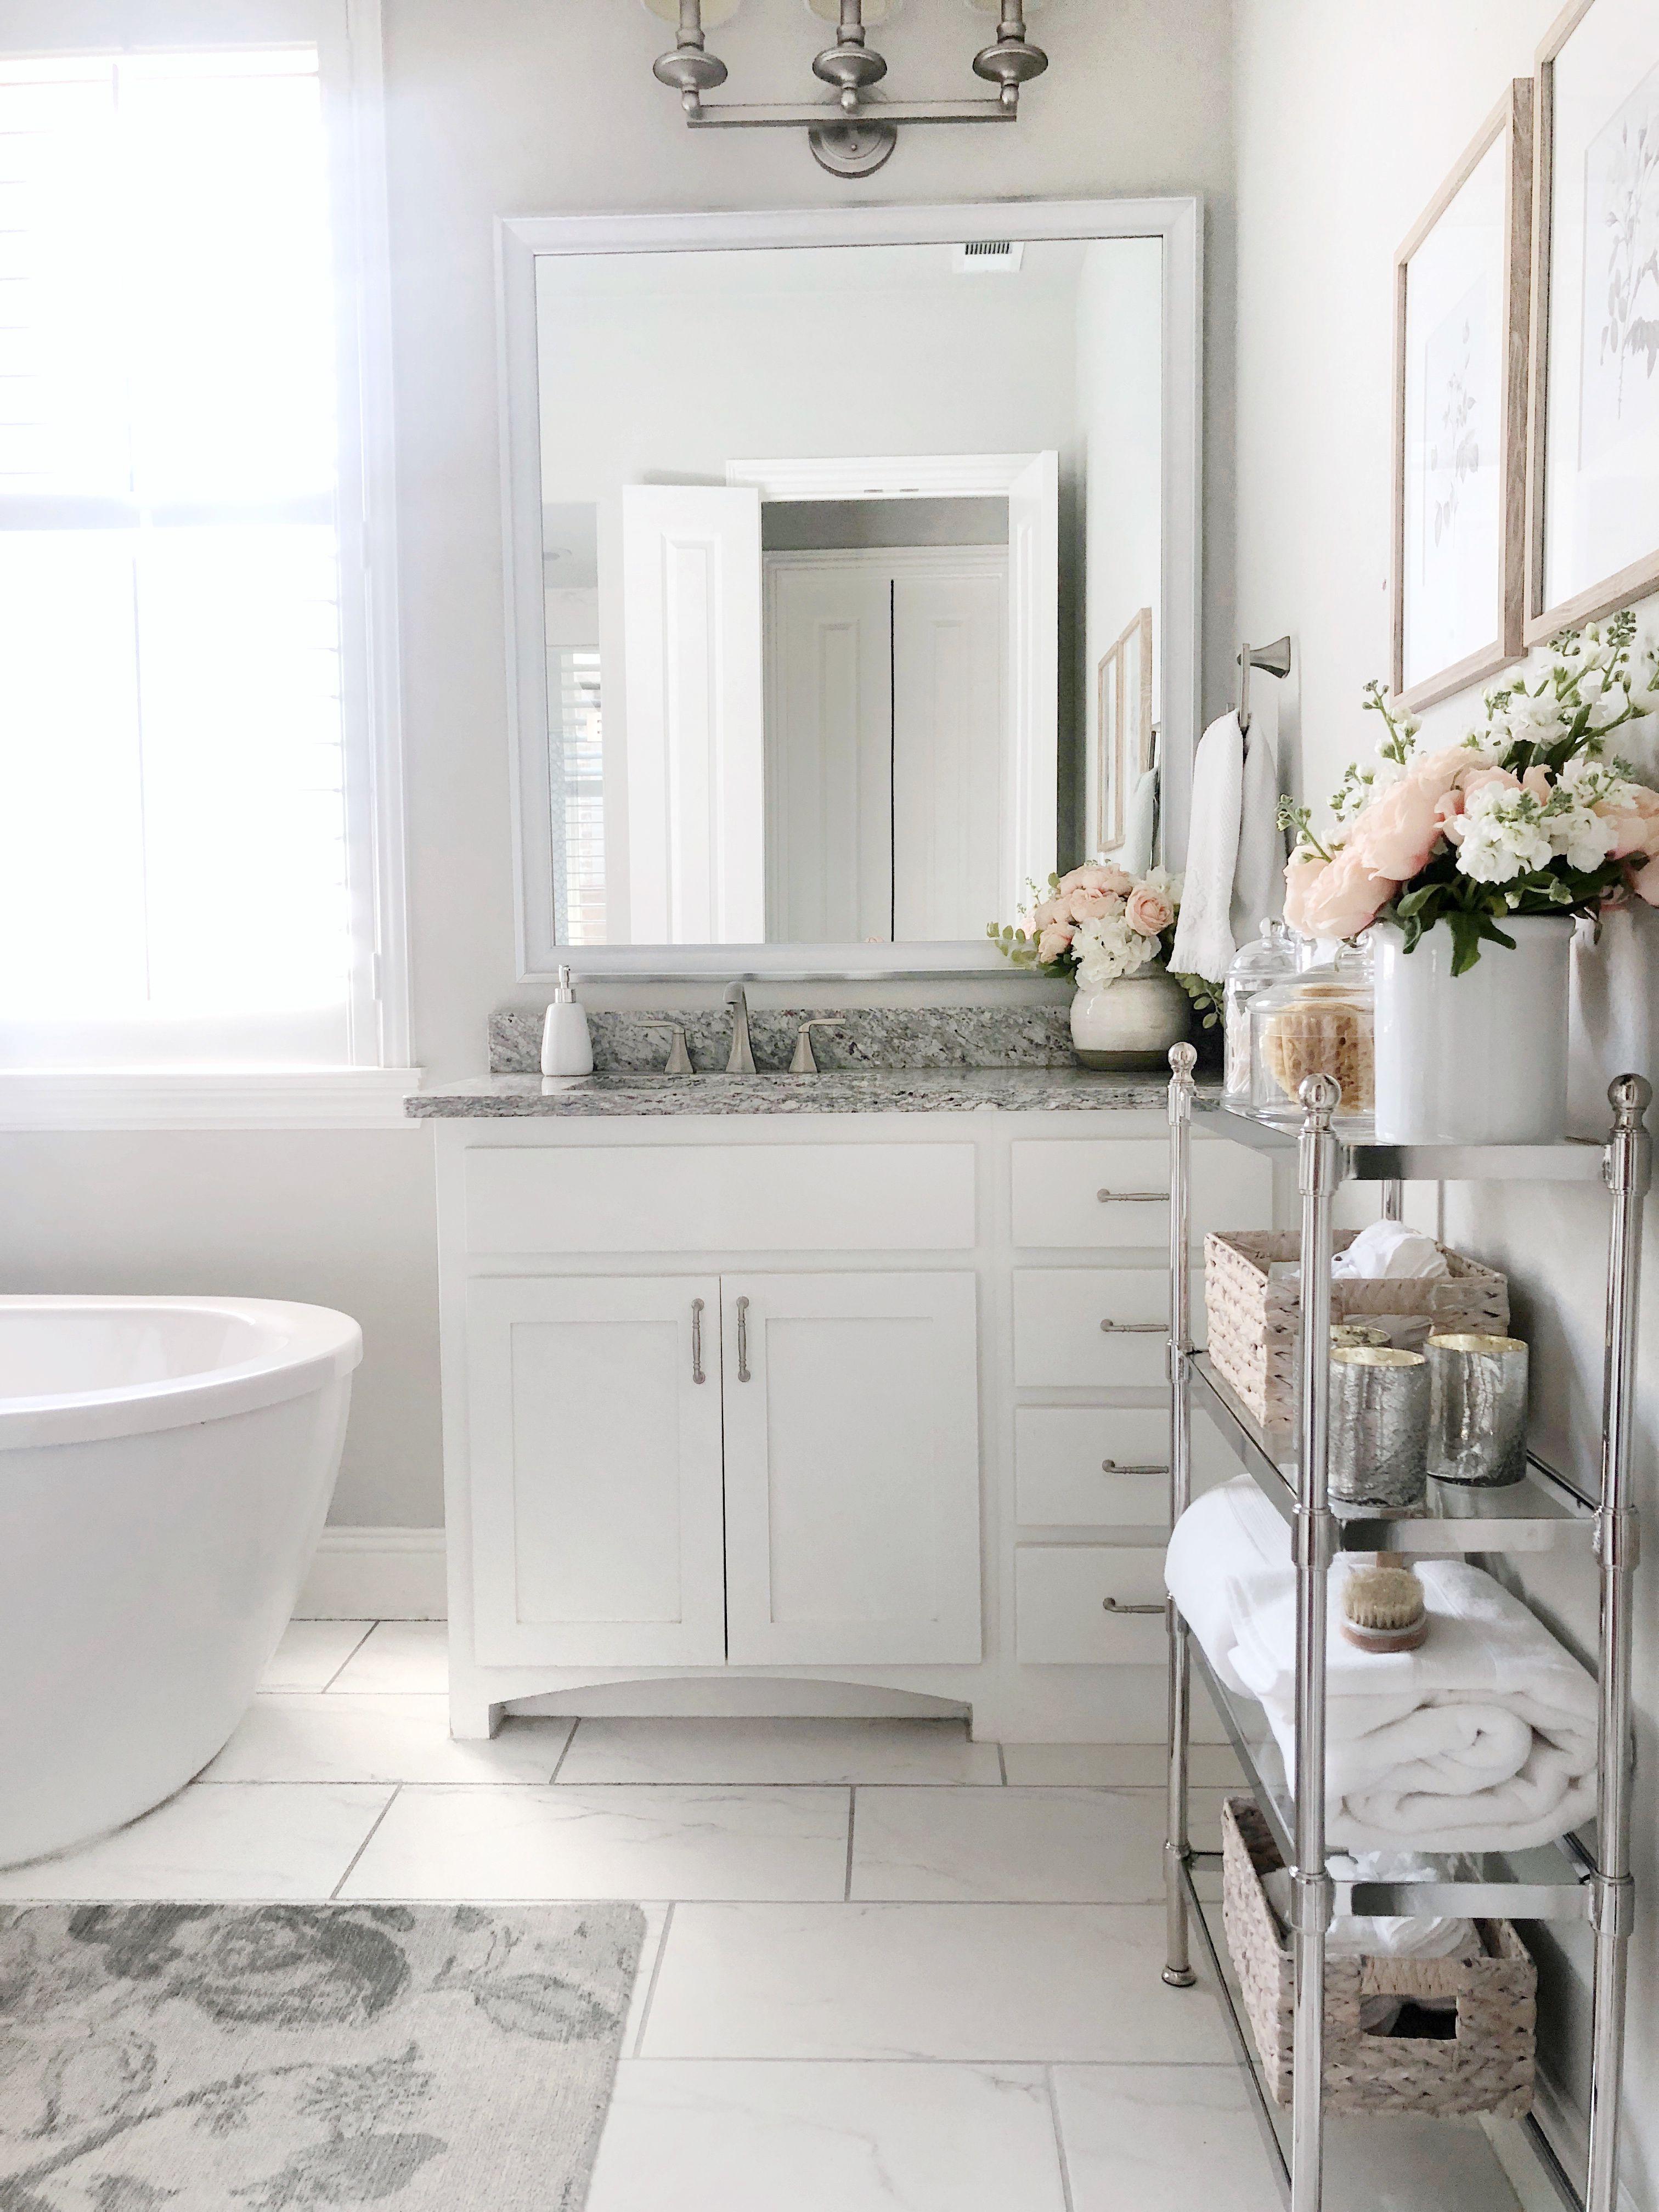 Pottery Barn Storage Solutions Bathroom Decor Marble Tile